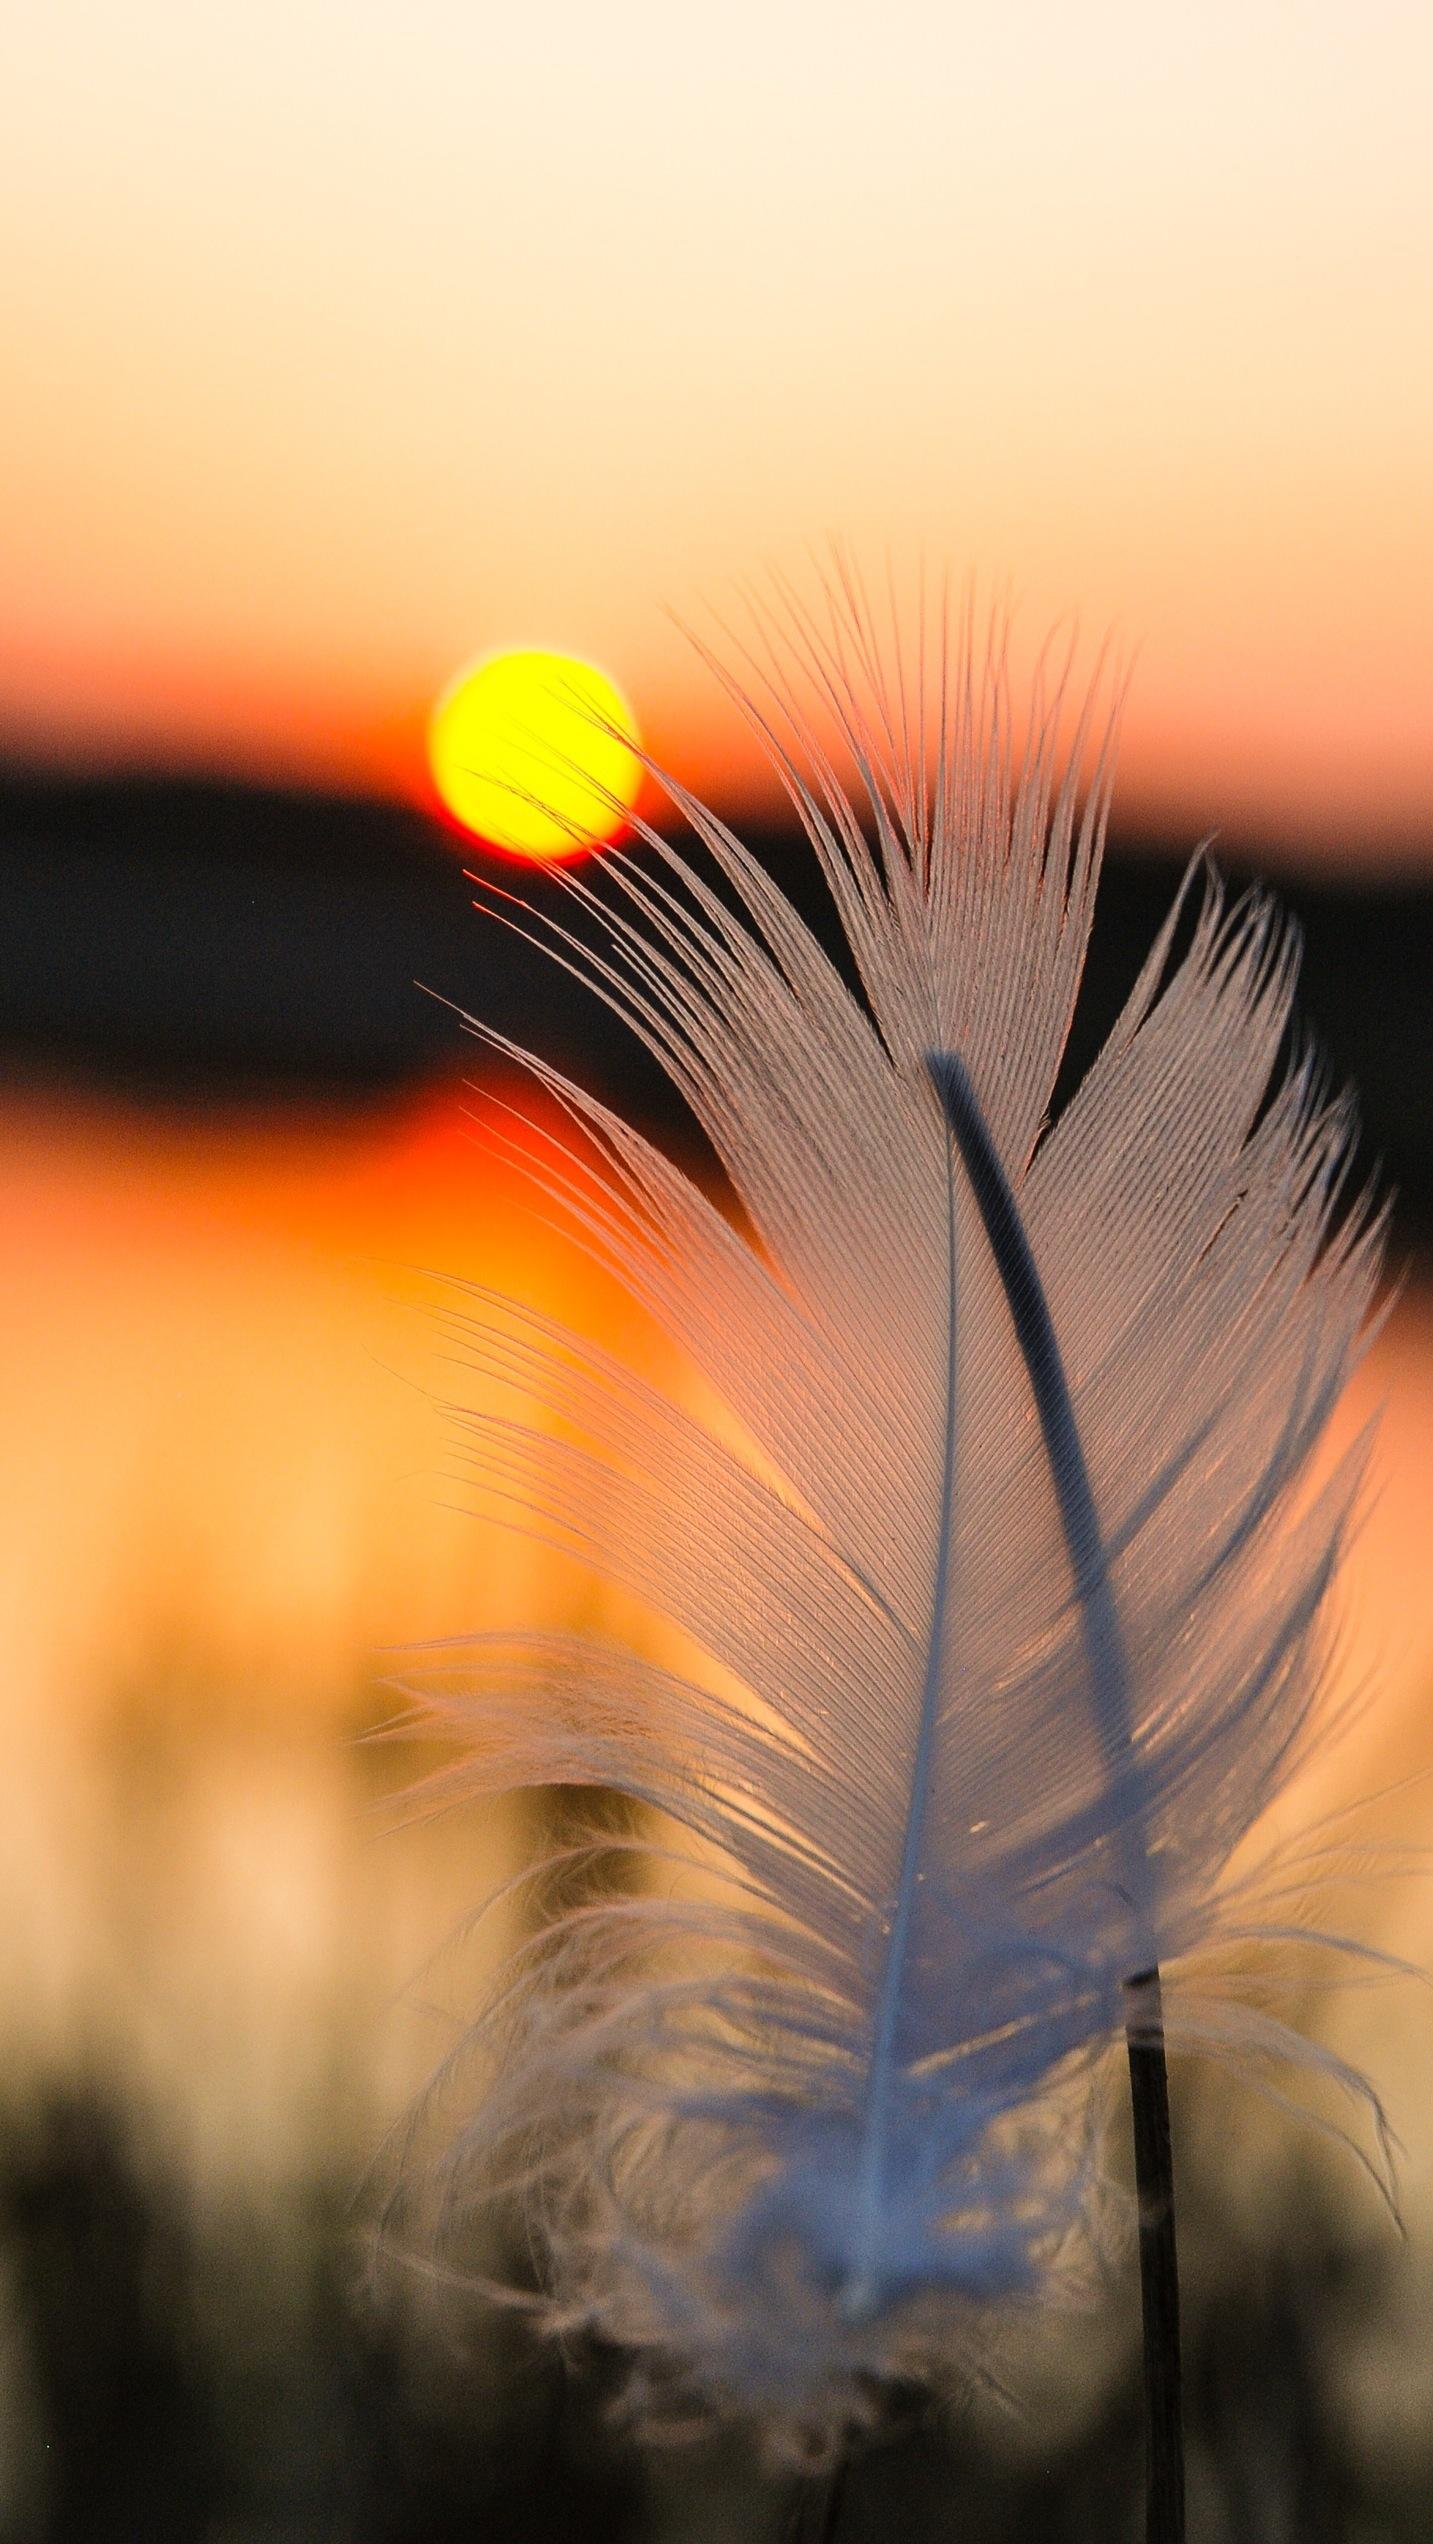 Golden Feather. Free Wallpaper